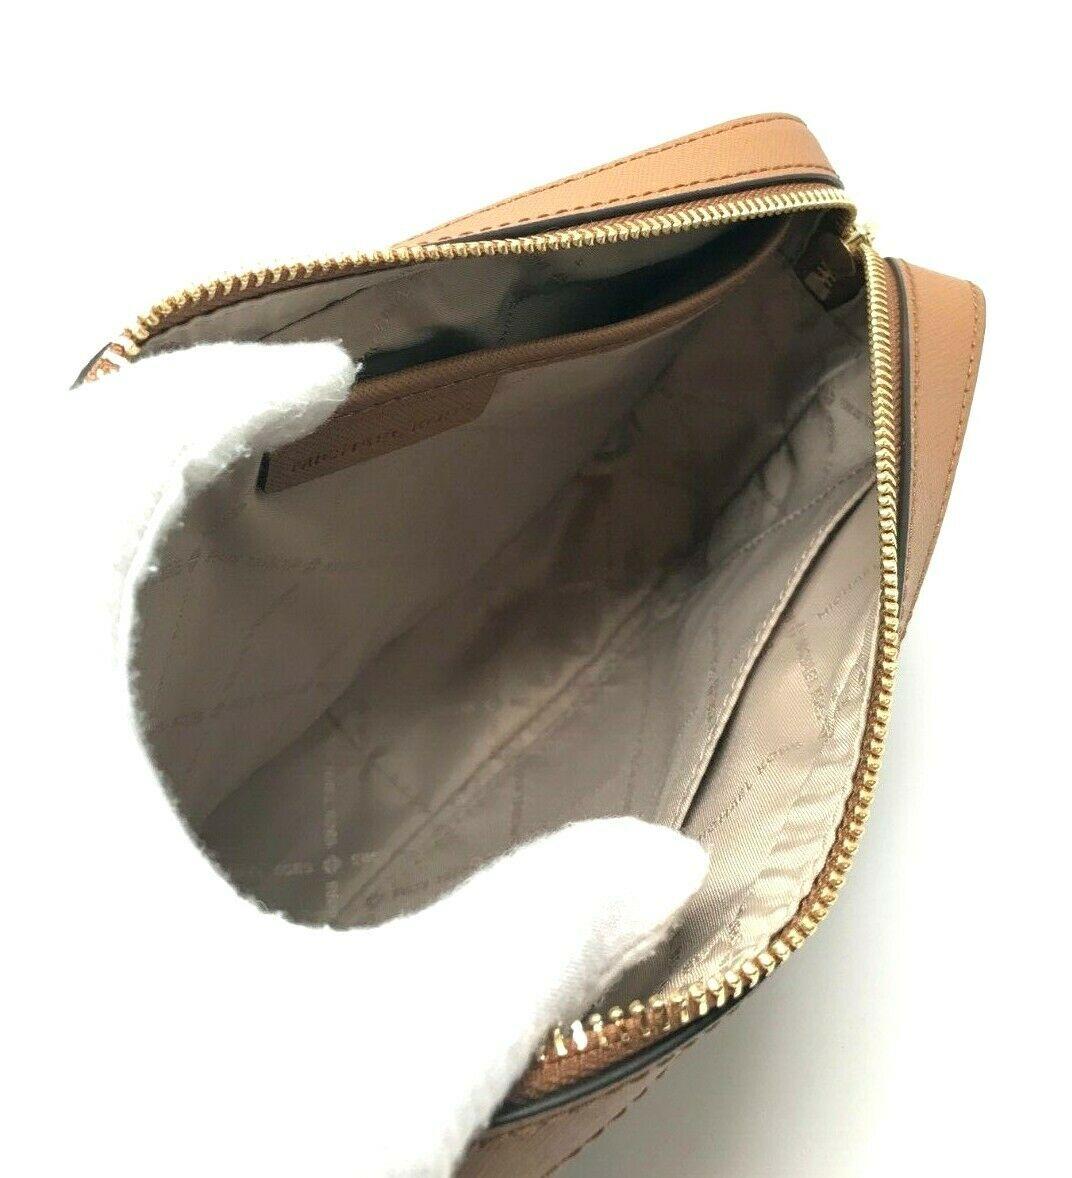 thumbnail 19 - Michael Kors Jet Set Item Large East West Crossbody Chain Handbag Clutch $298